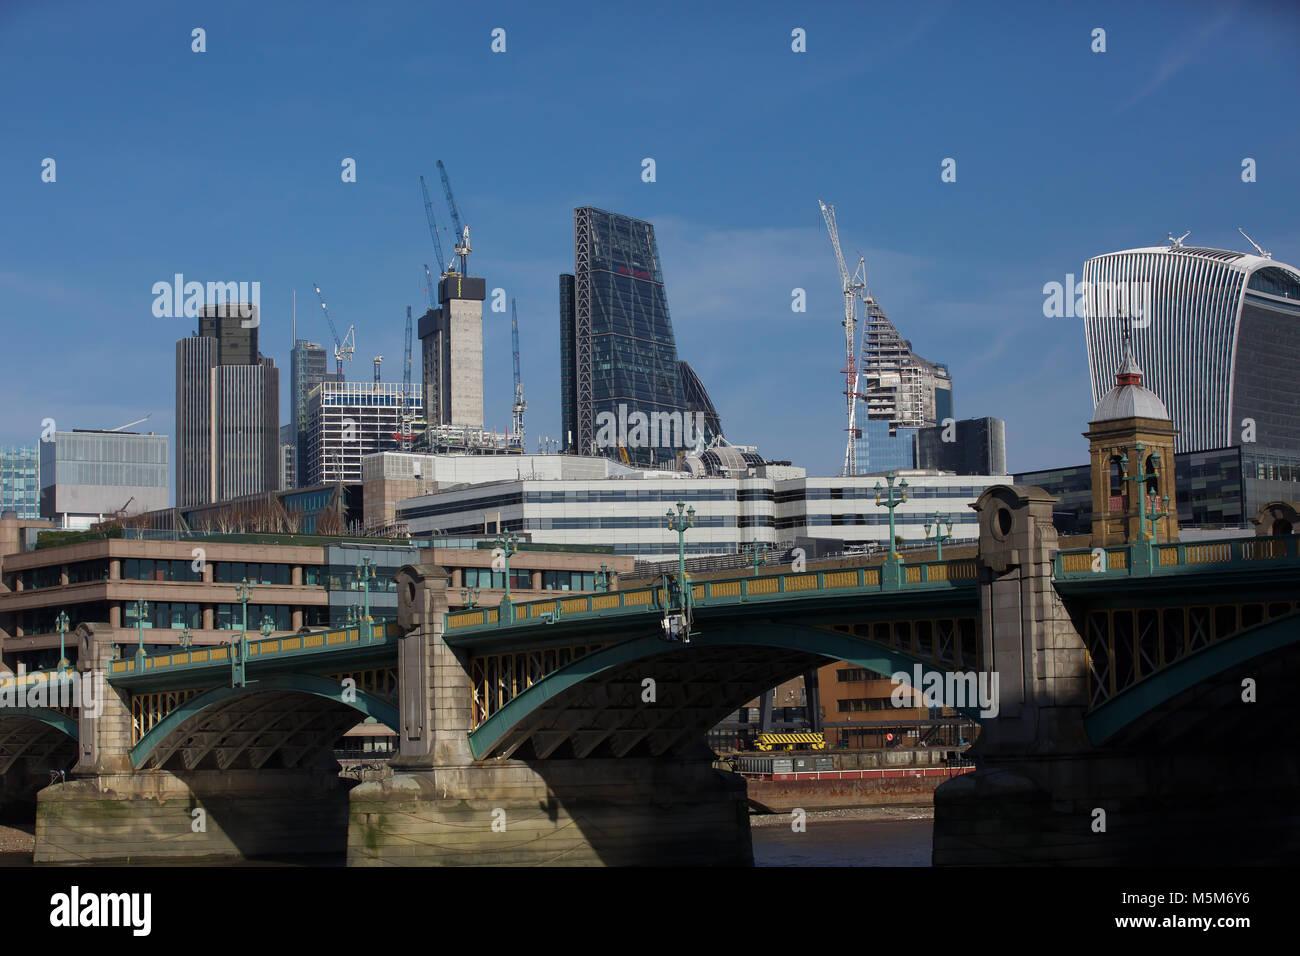 London, UK, 24 Feb 2018. Blue skies over the London Skyline©Keith Larby/Alamy Live News - Stock Image